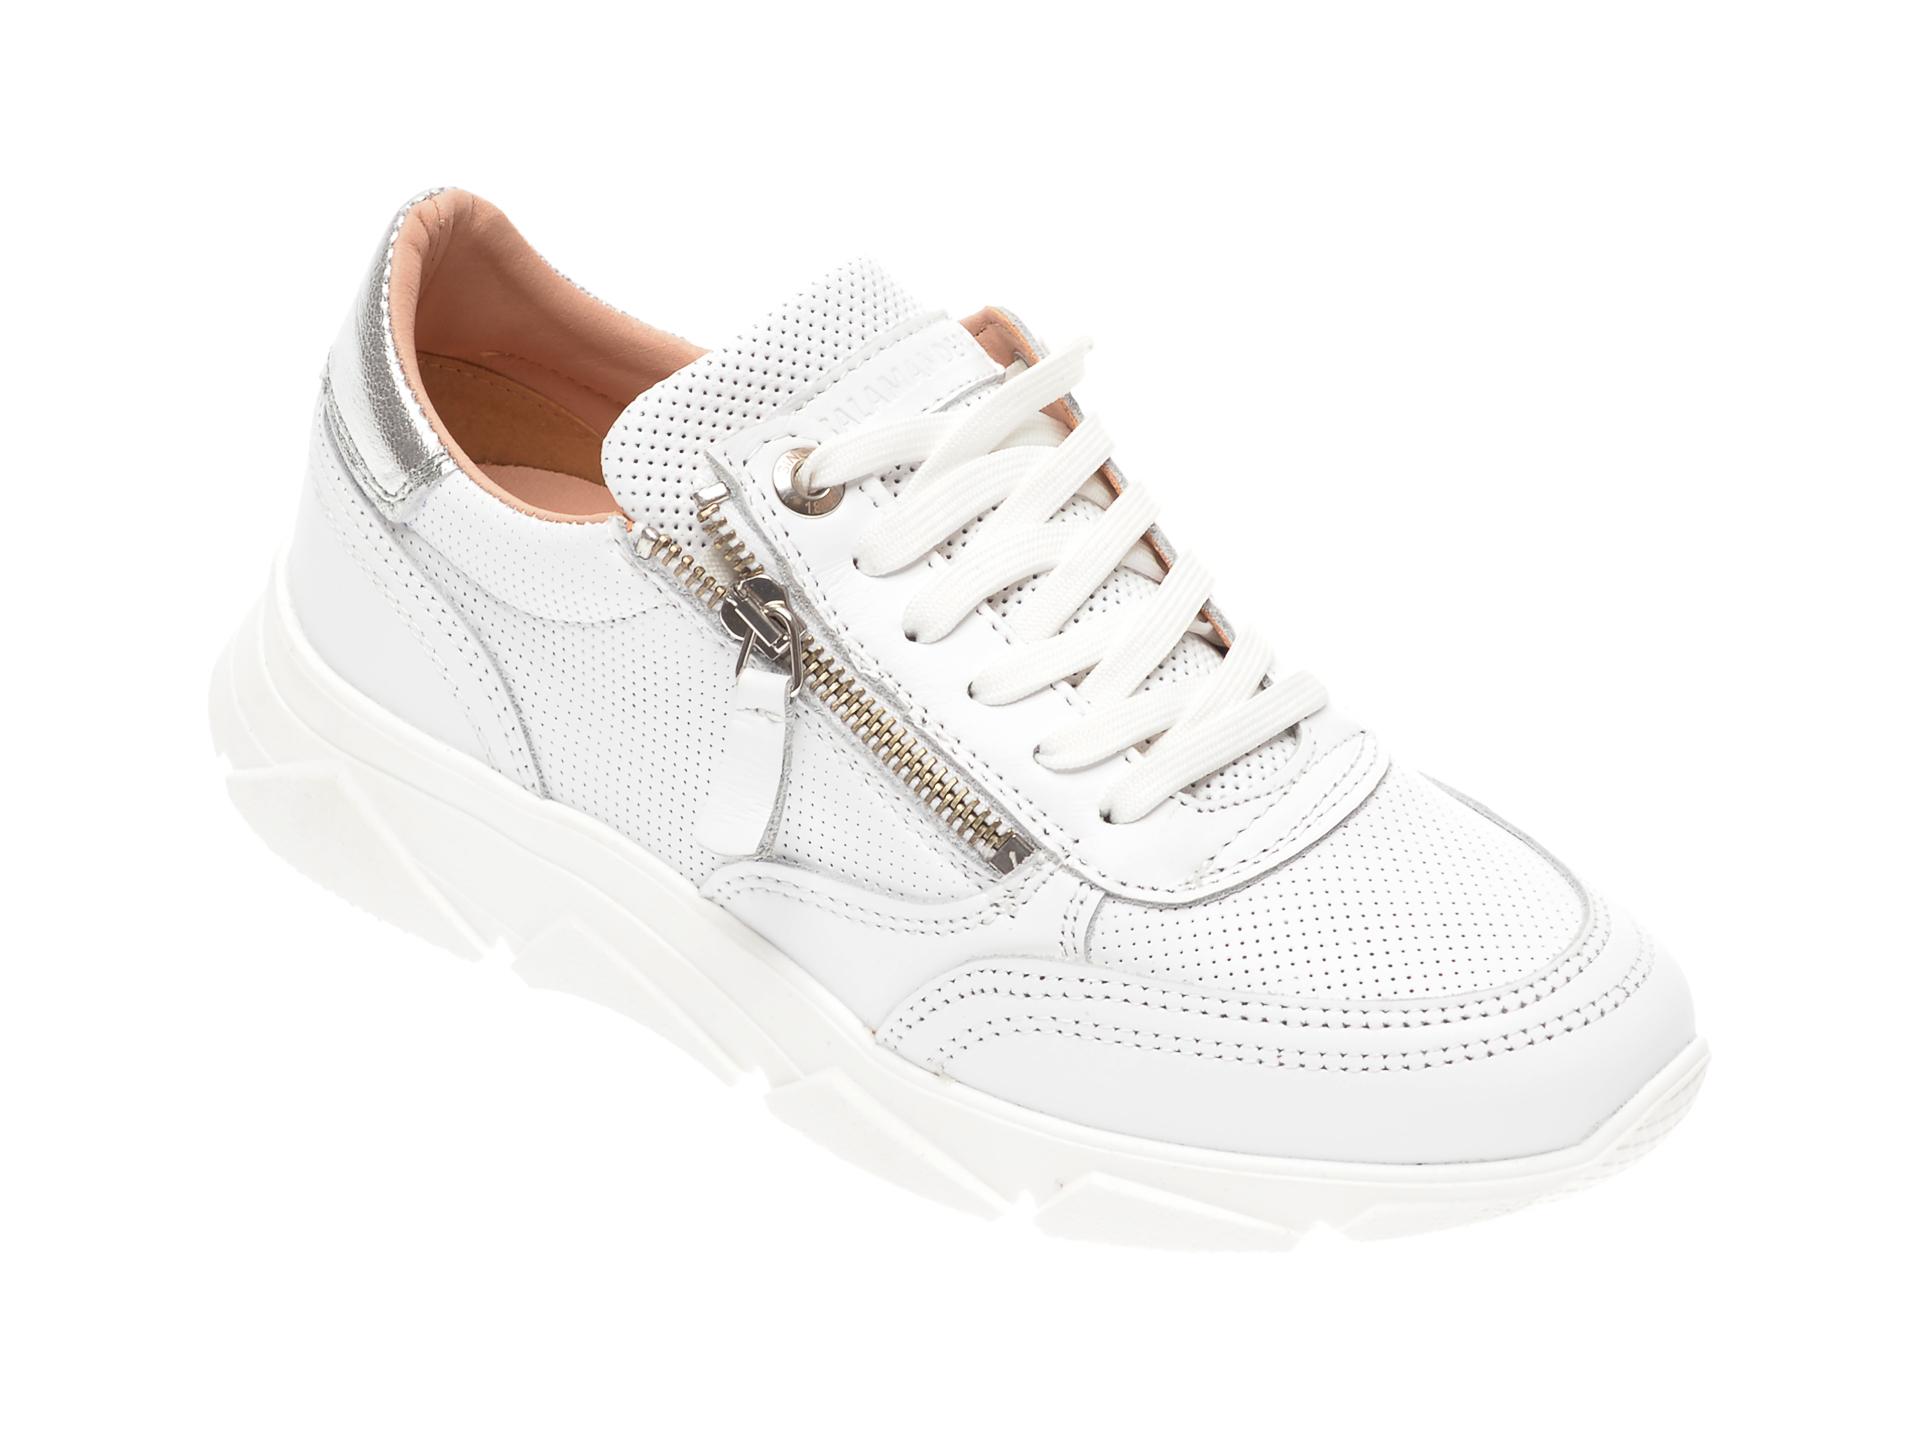 Pantofi sport SALAMANDER albi, 55402, din piele naturala imagine